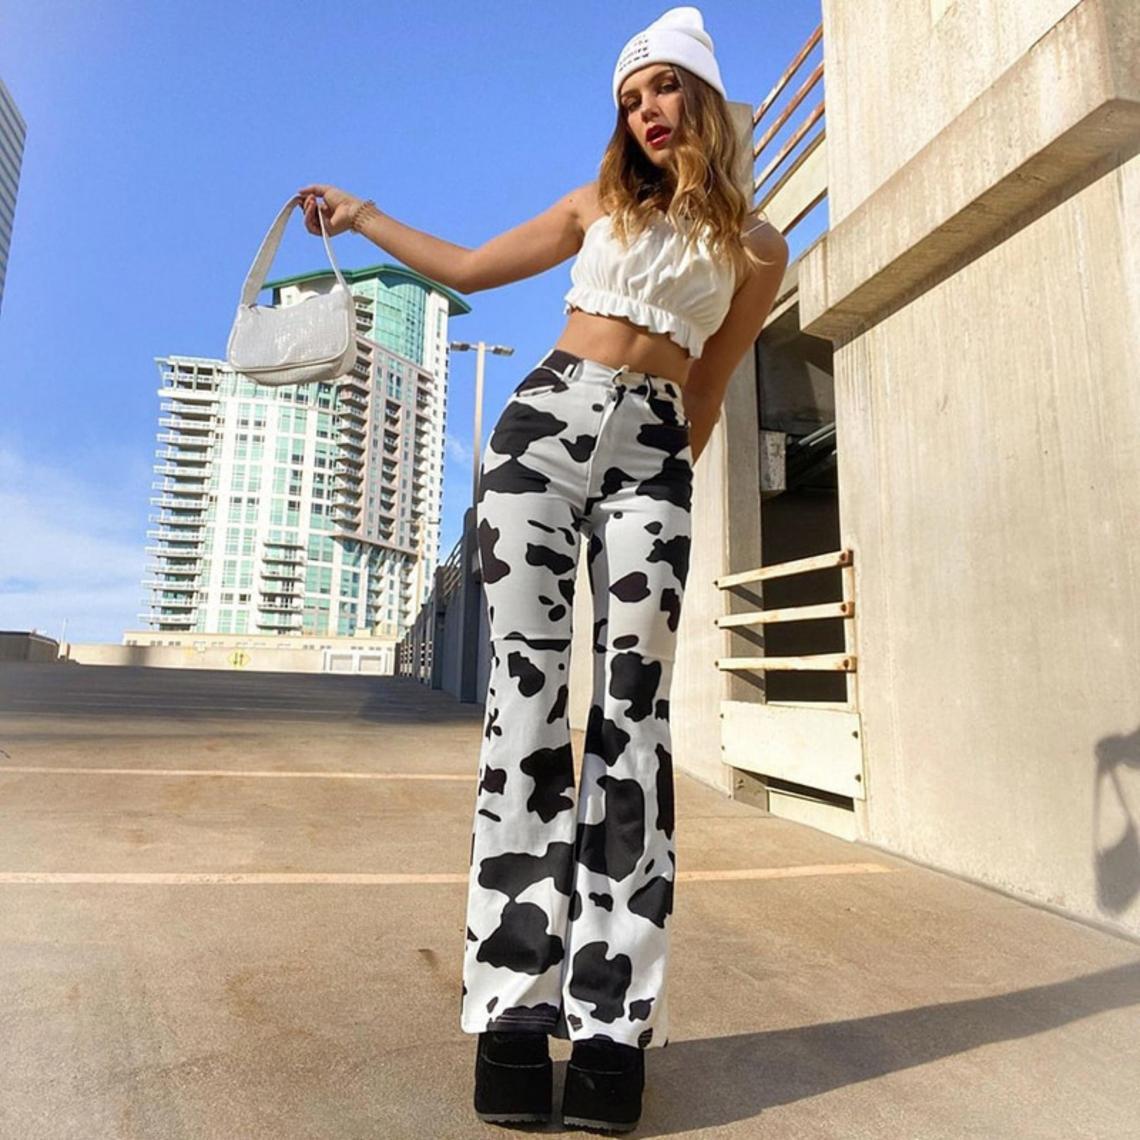 Y2K Cow Print Baggy Jeans Woman High Waist Streetwear Cargo Pants Streetwear / Korean Fashion / Elastic Waist Pants / Denim Jeans